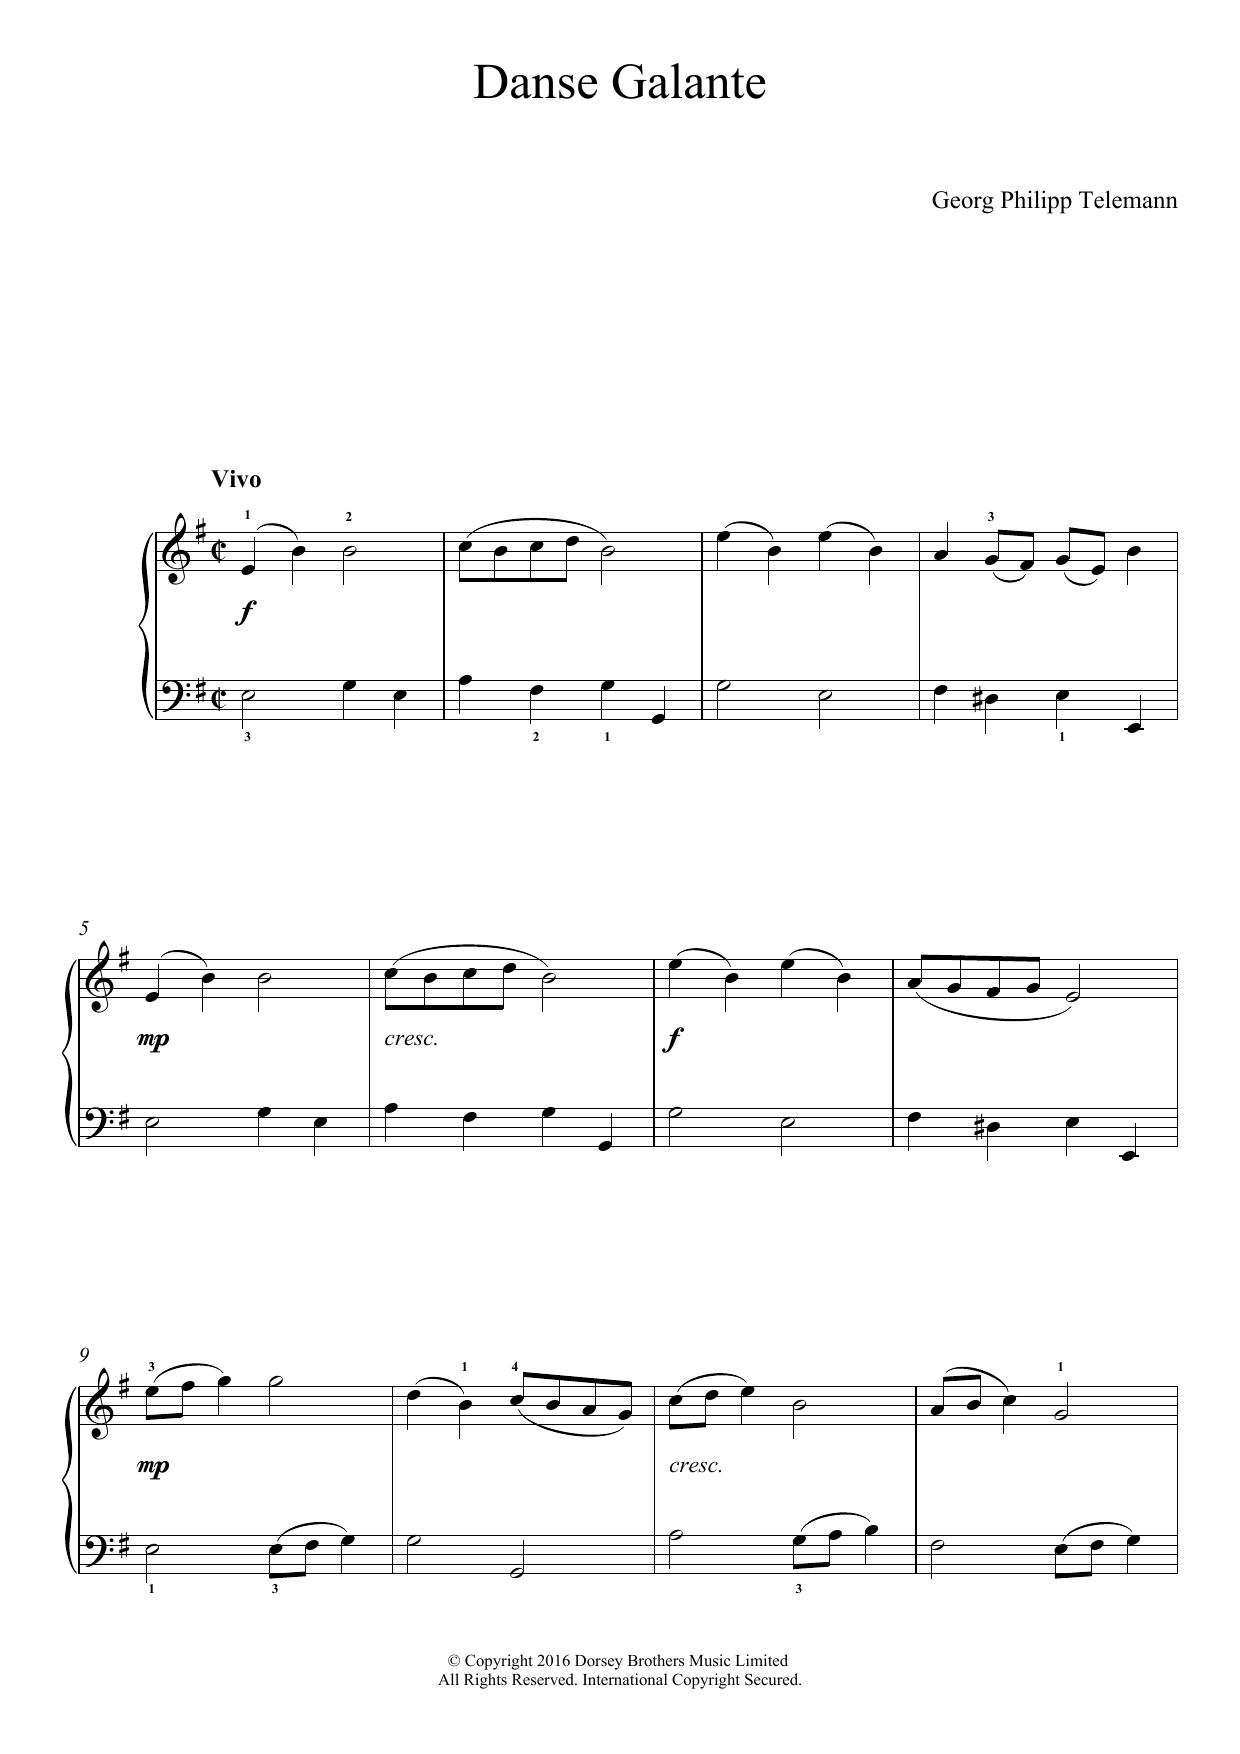 Georg Philipp Telemann - Danse Galante